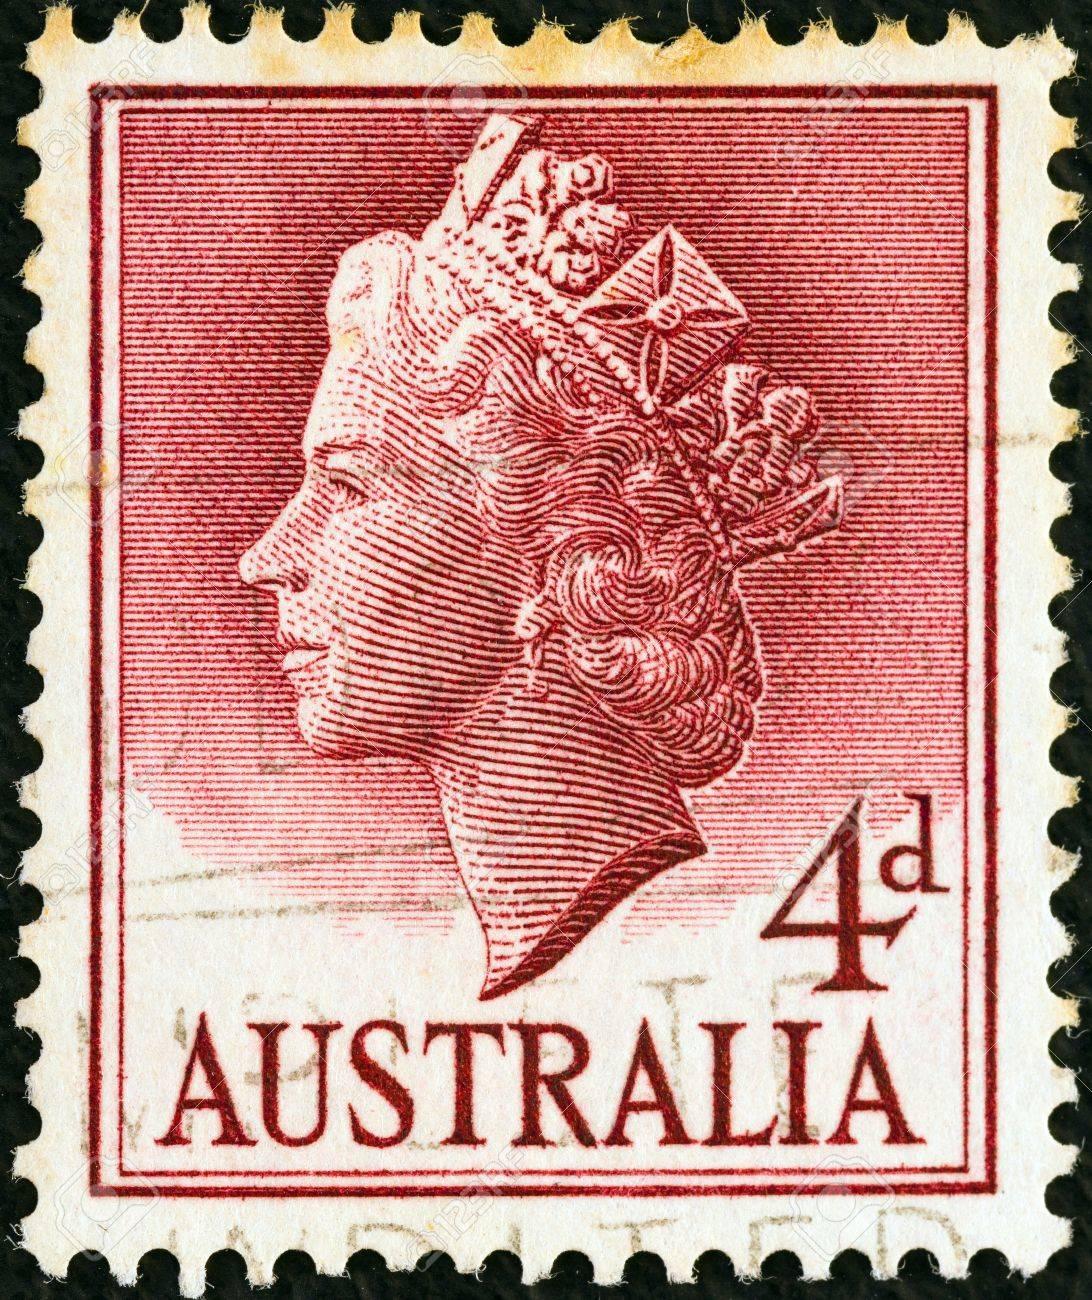 AUSTRALIA - CIRCA 1955: A stamp printed in Australia shows Queen Elizabeth II, circa 1955.  Stock Photo - 17298595